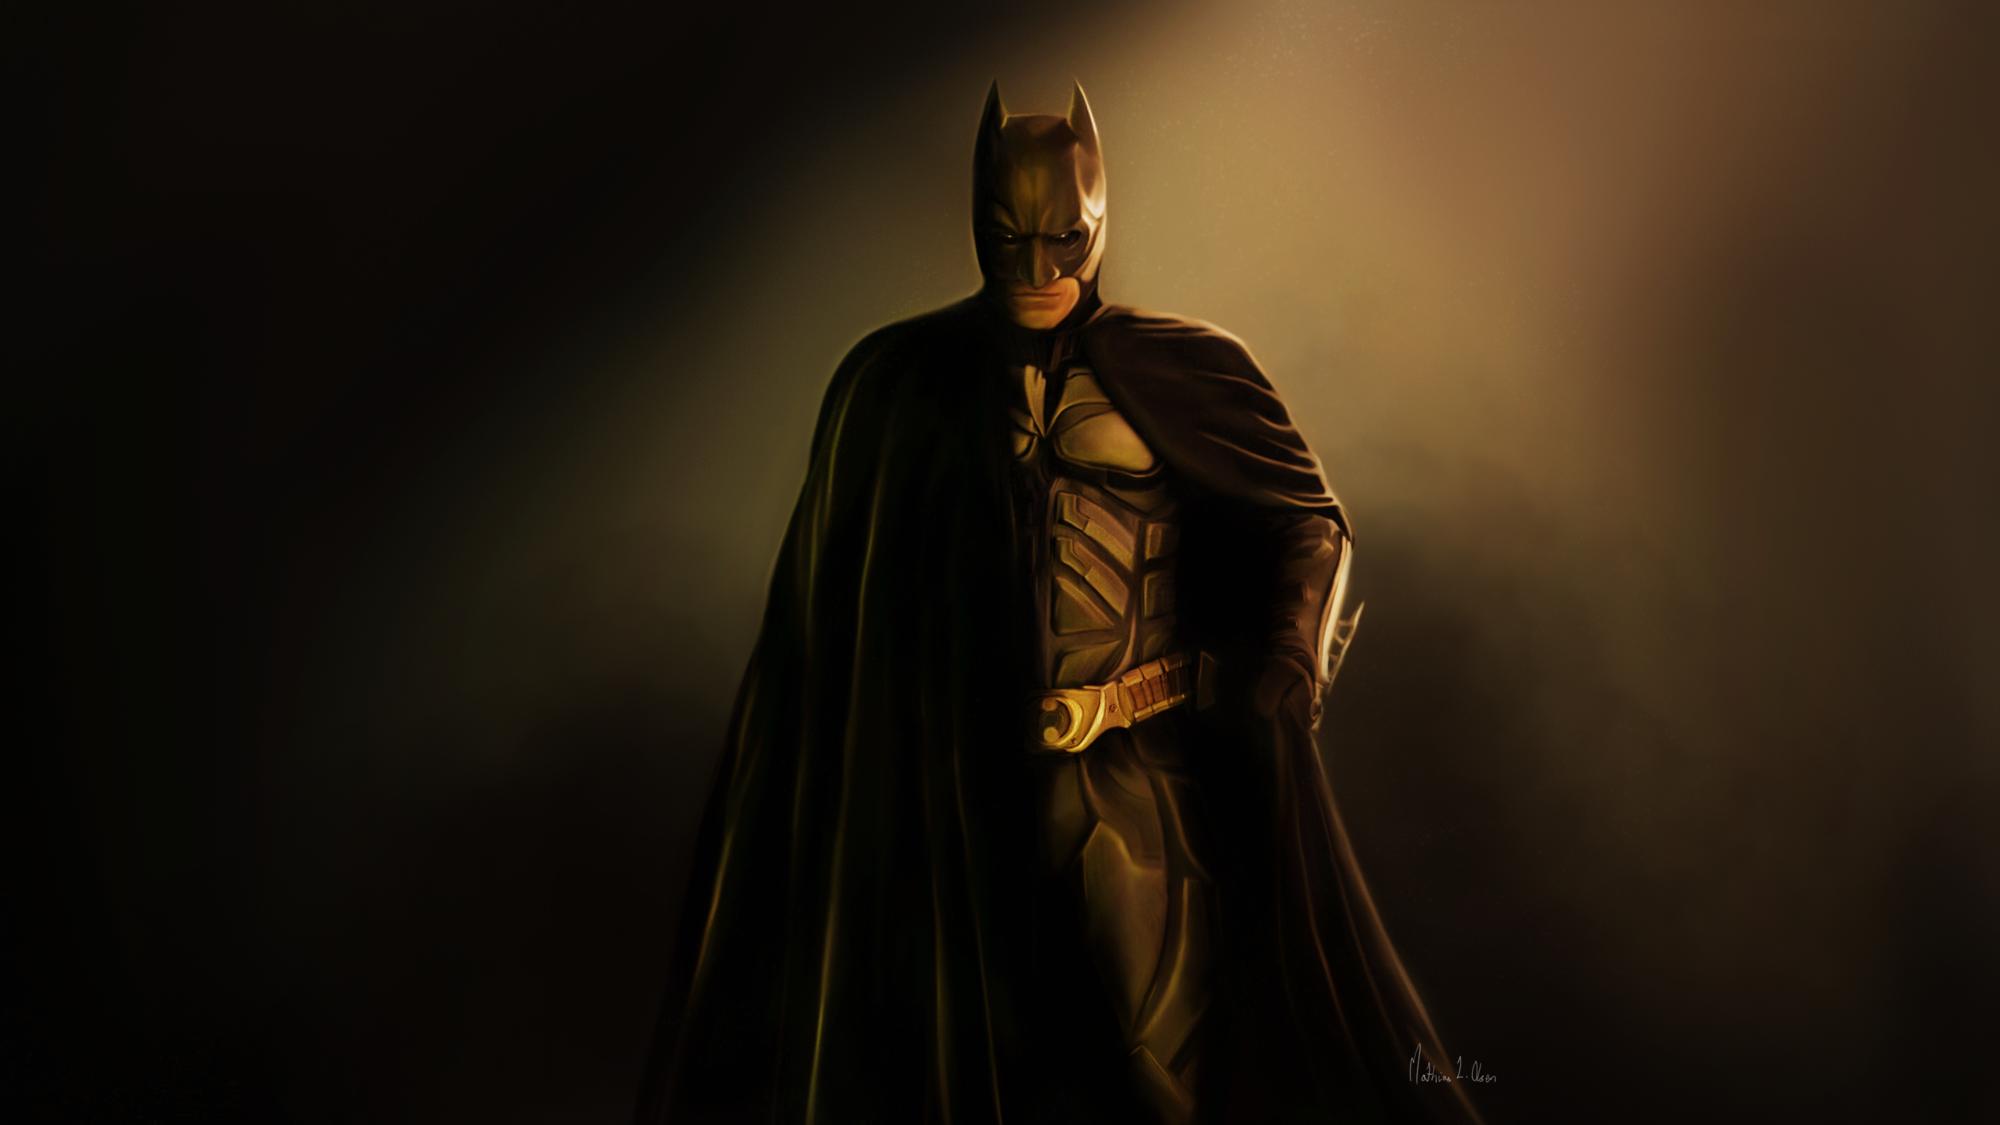 Batman - Painting by Lasse17